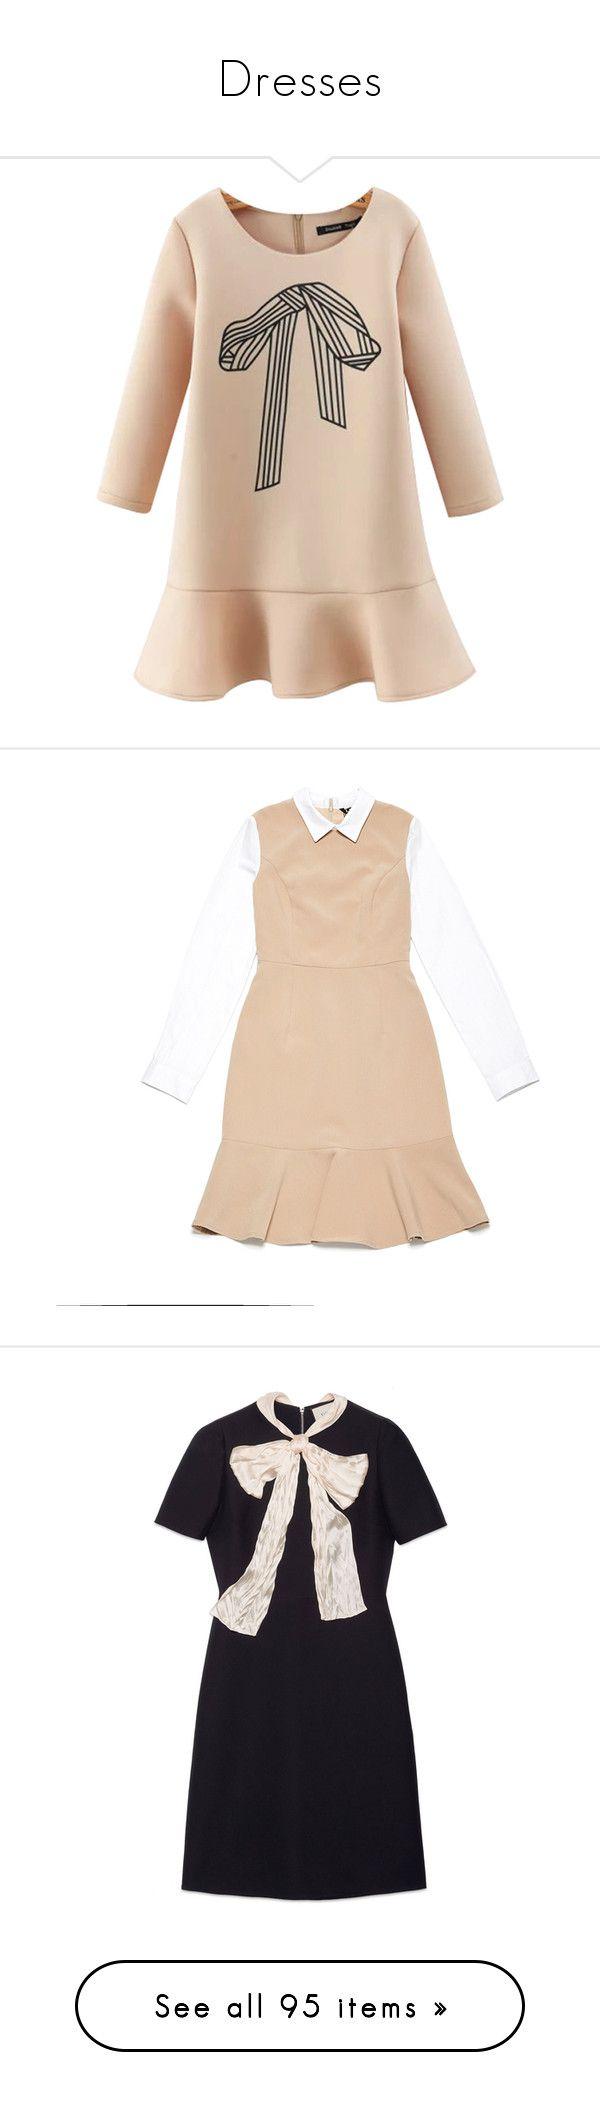 """Dresses"" by joy-fangirl ❤ liked on Polyvore featuring dresses, vestidos, платья, short dresses, beige peplum dress, longsleeve dress, peplum mini dress, beige long sleeve dress, ready-to-wear and women"